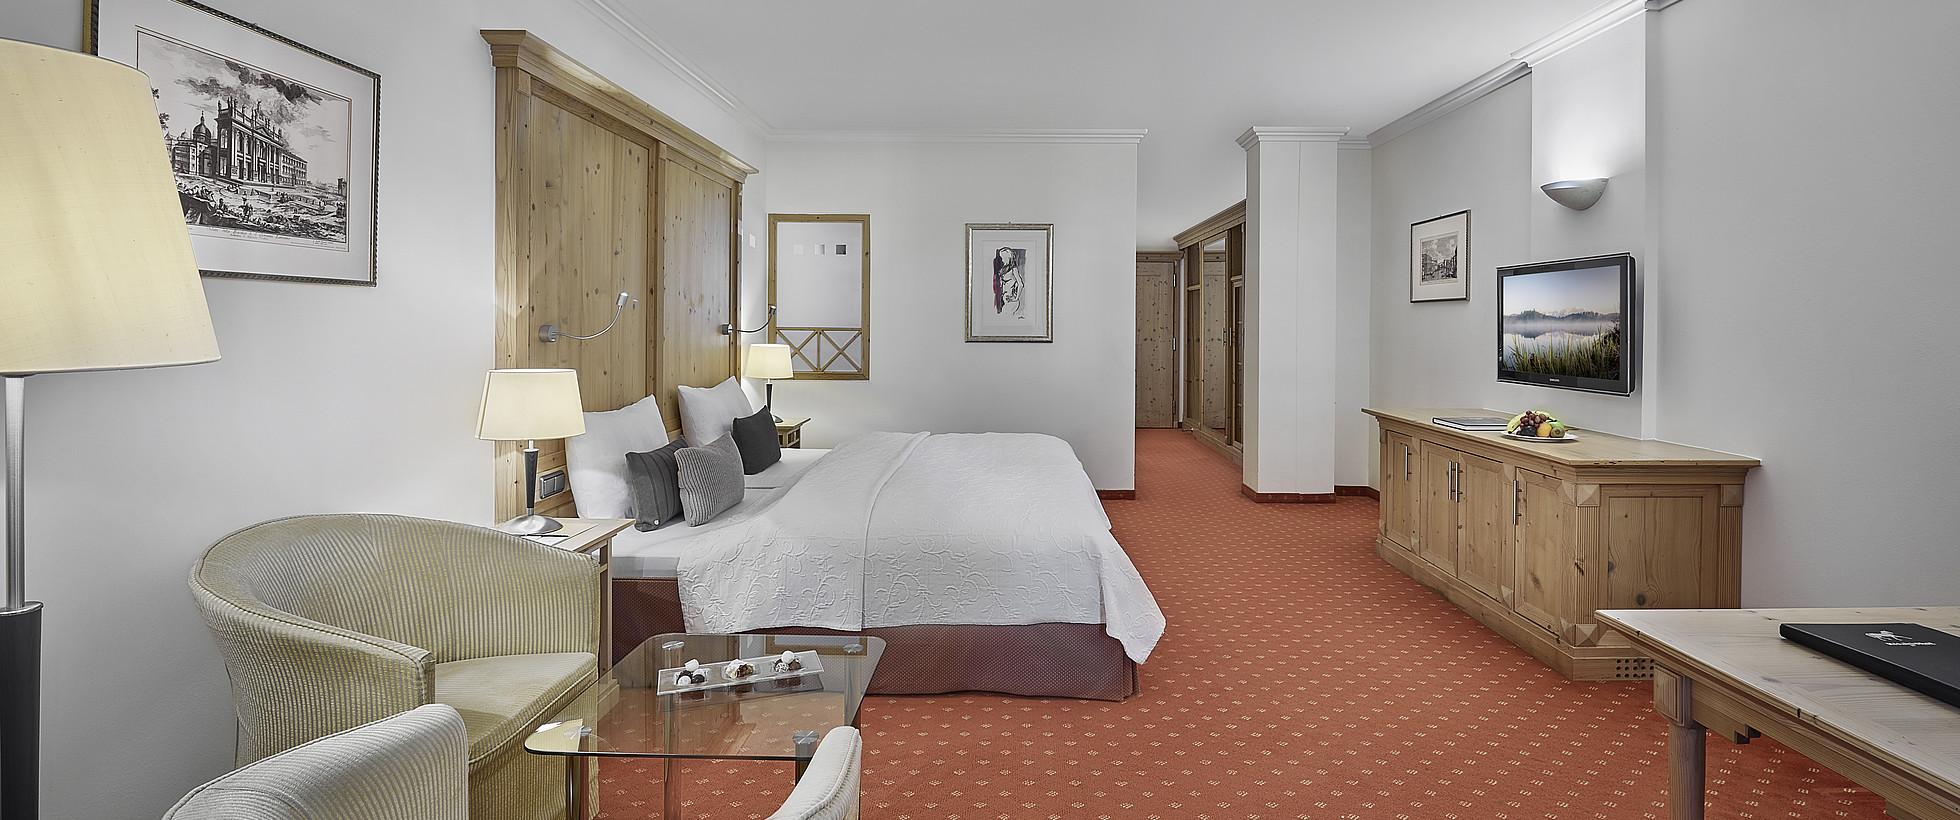 Superior zimmer residenz greif hotel weisses r ssl kitzb hel for Superior zimmer